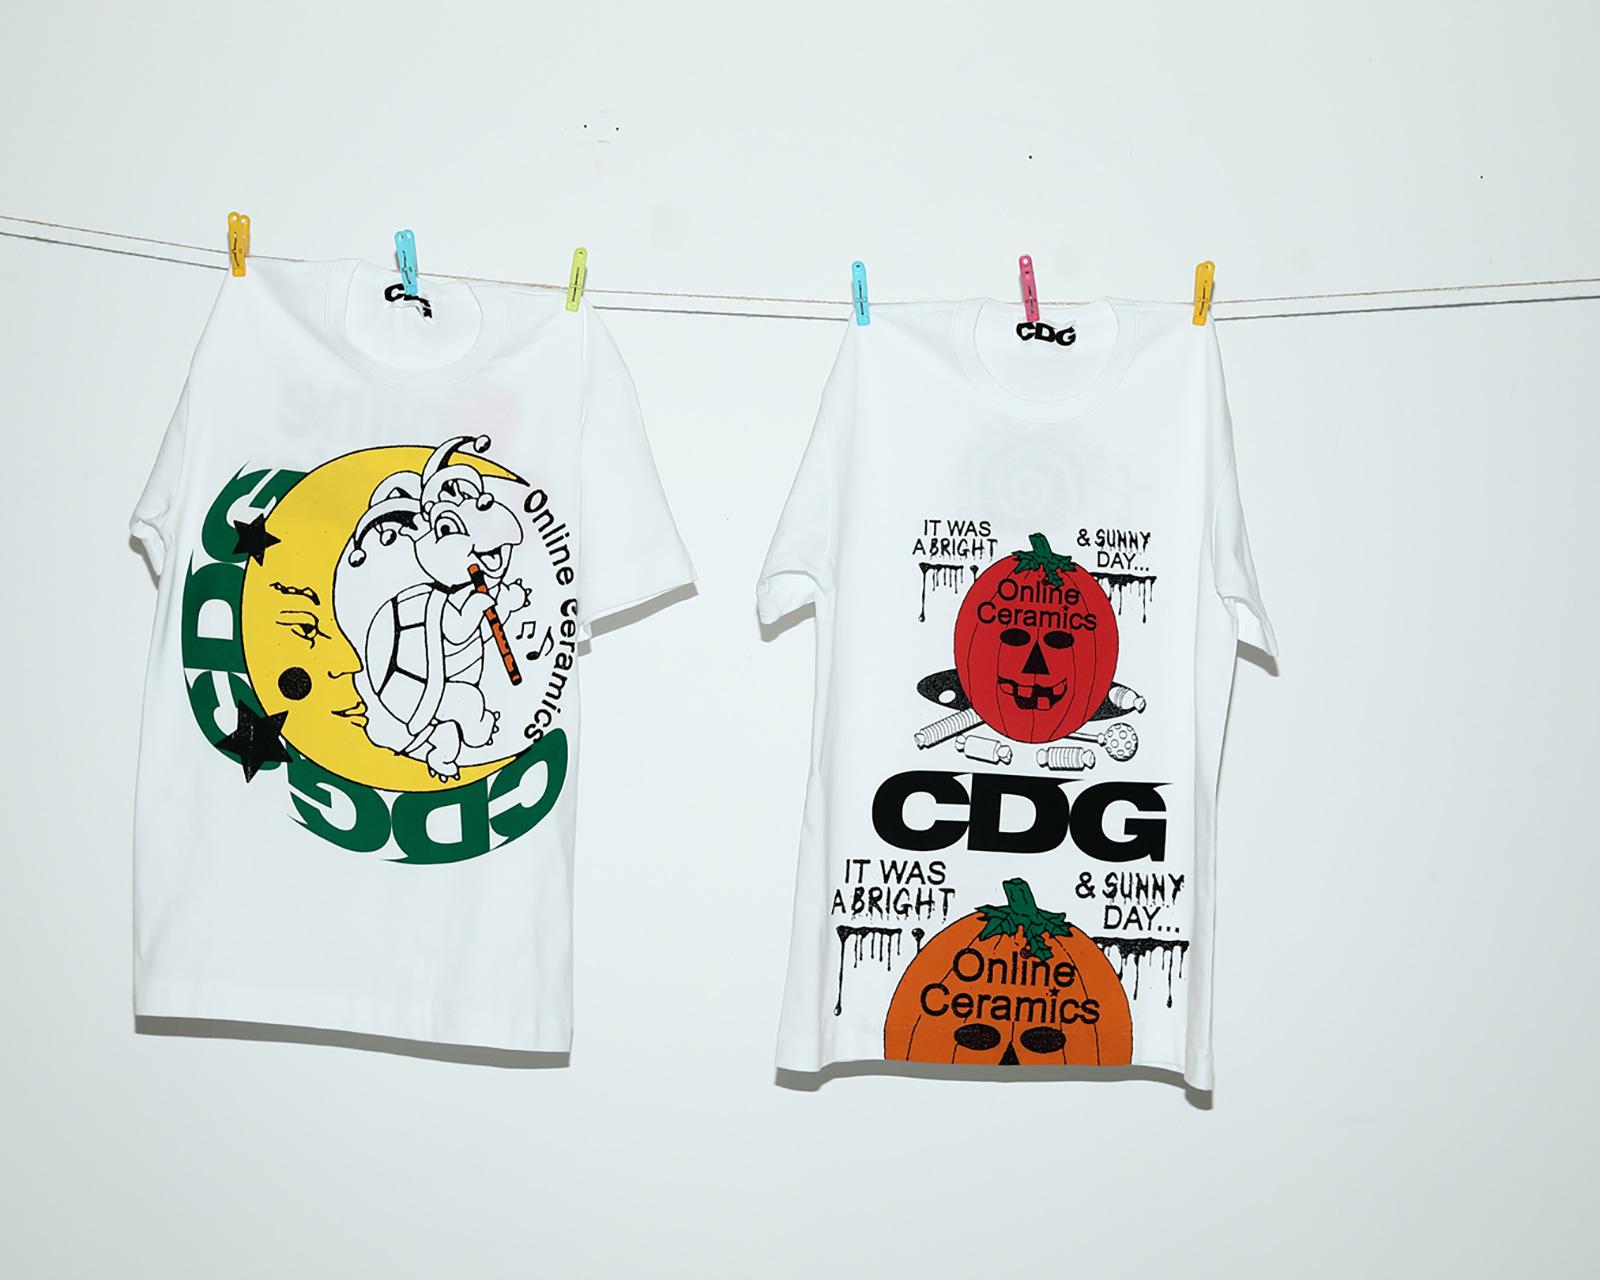 CDG x Online Ceramics